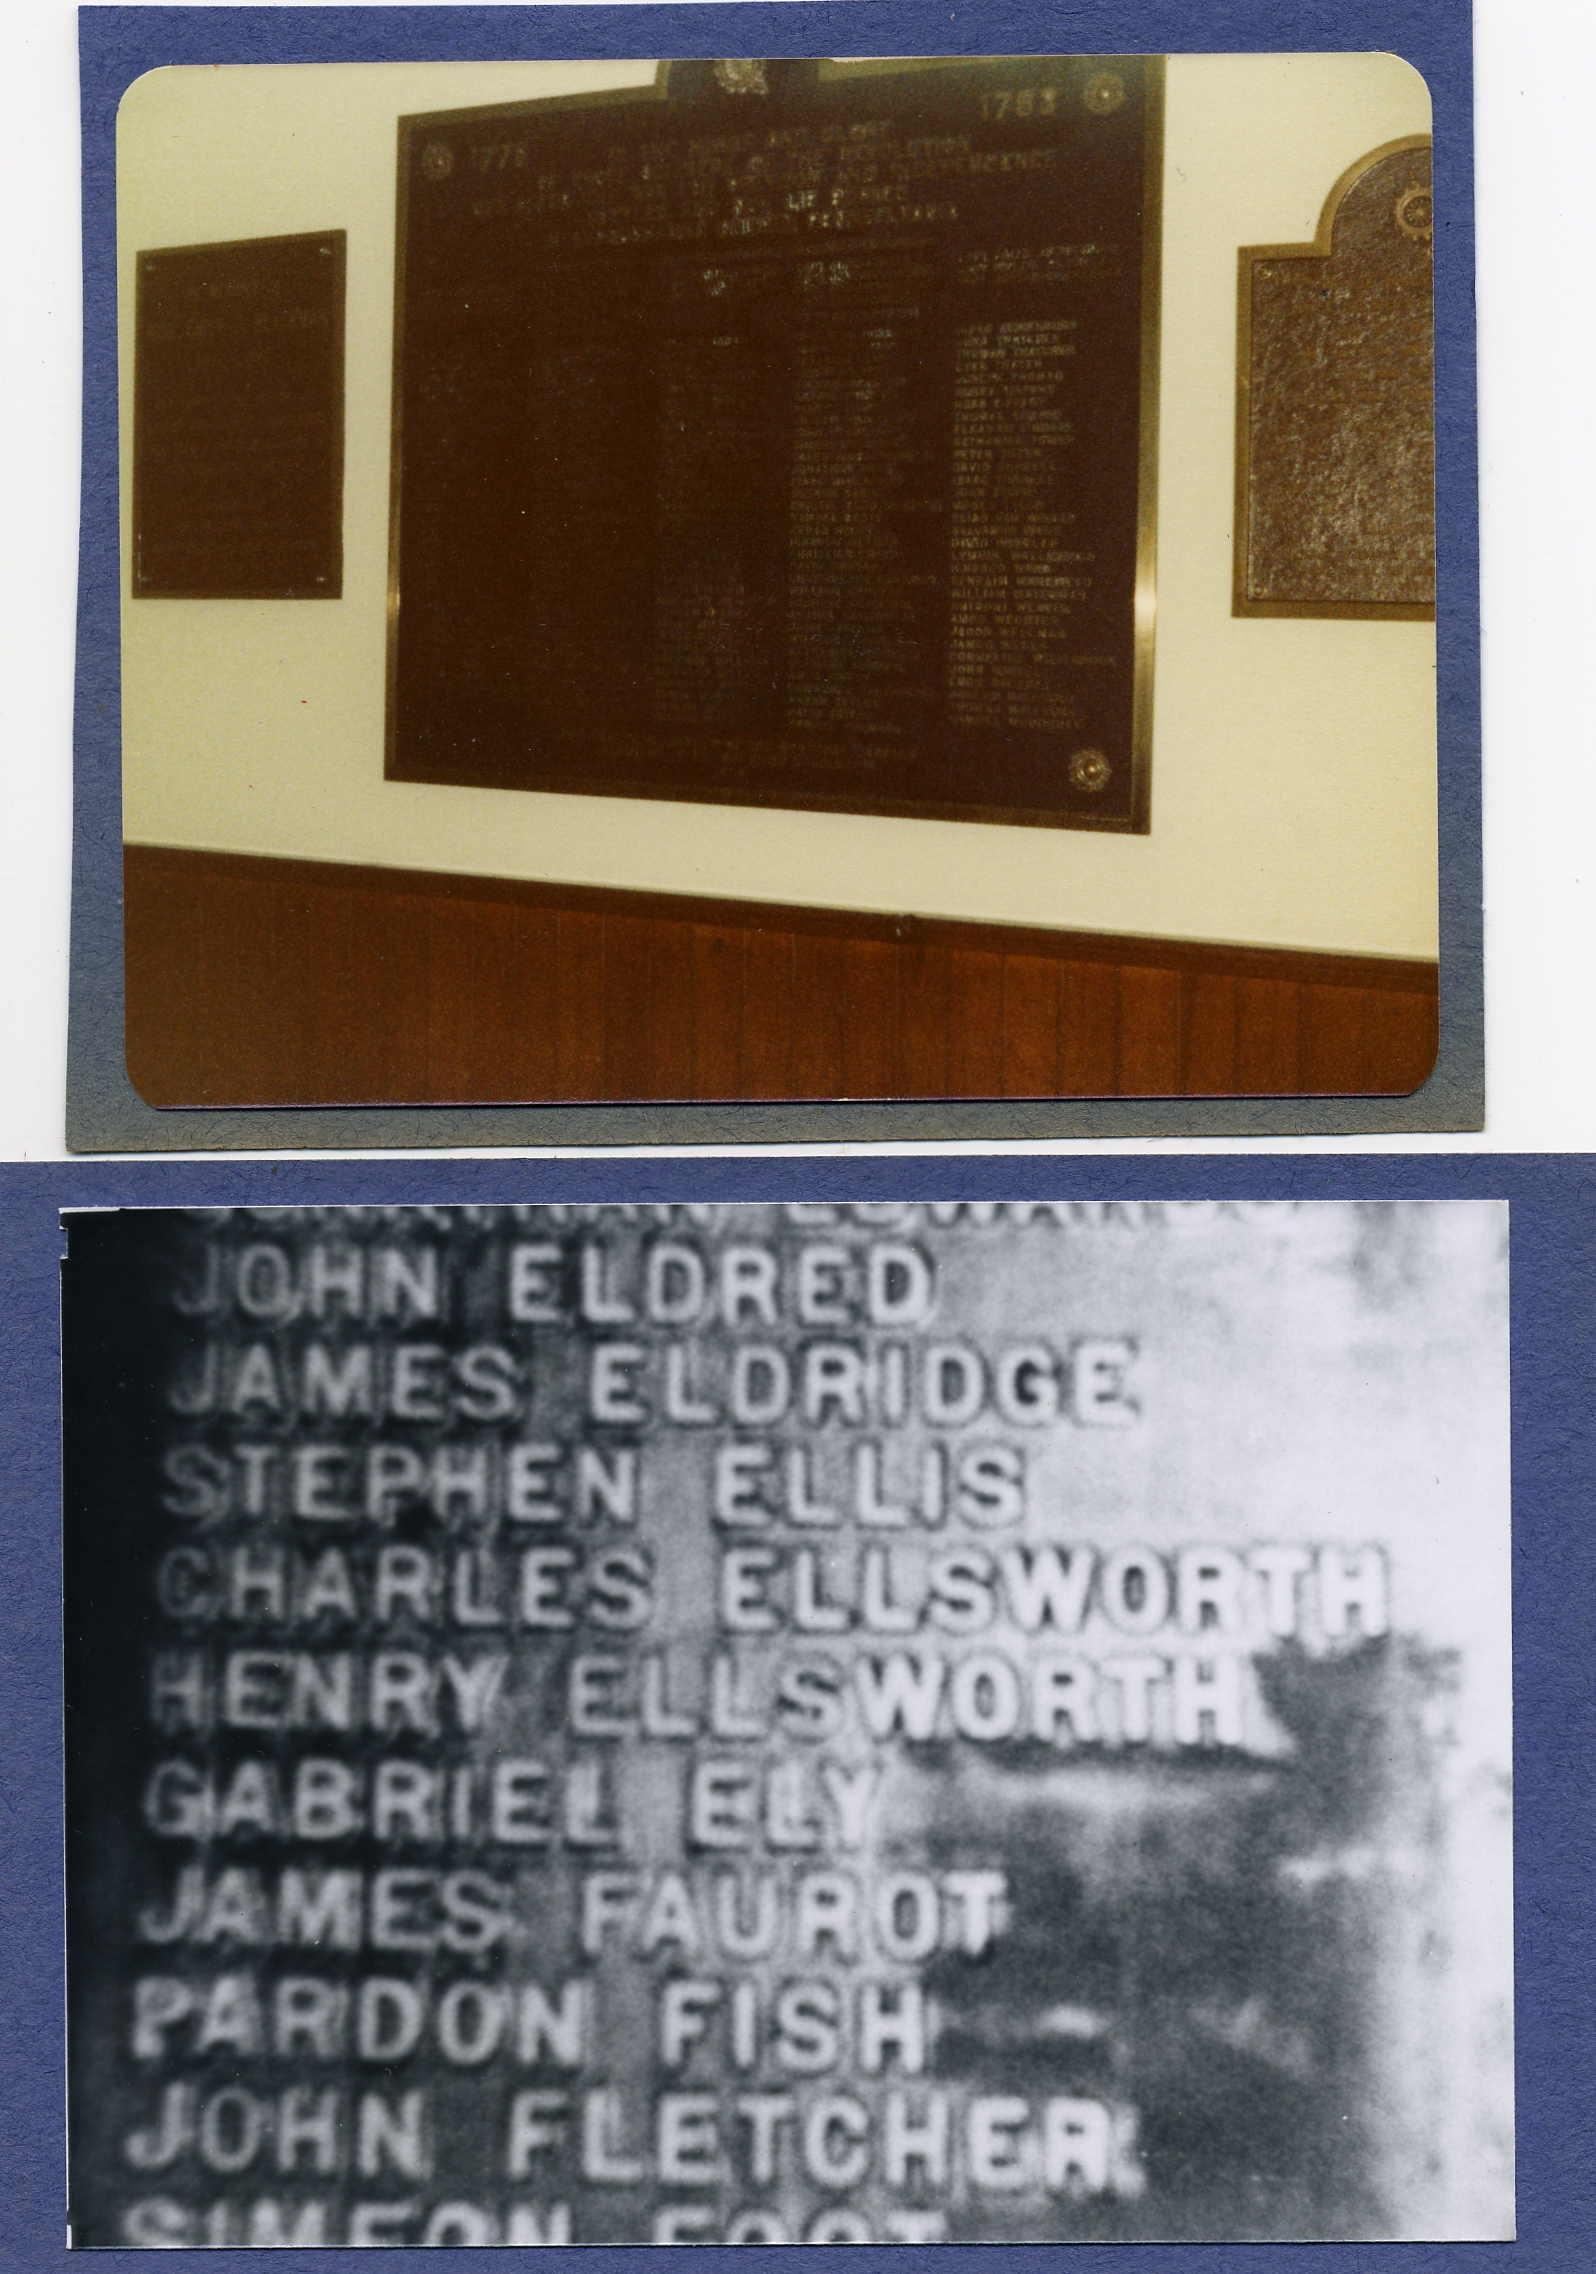 Gustavus Ellsworth